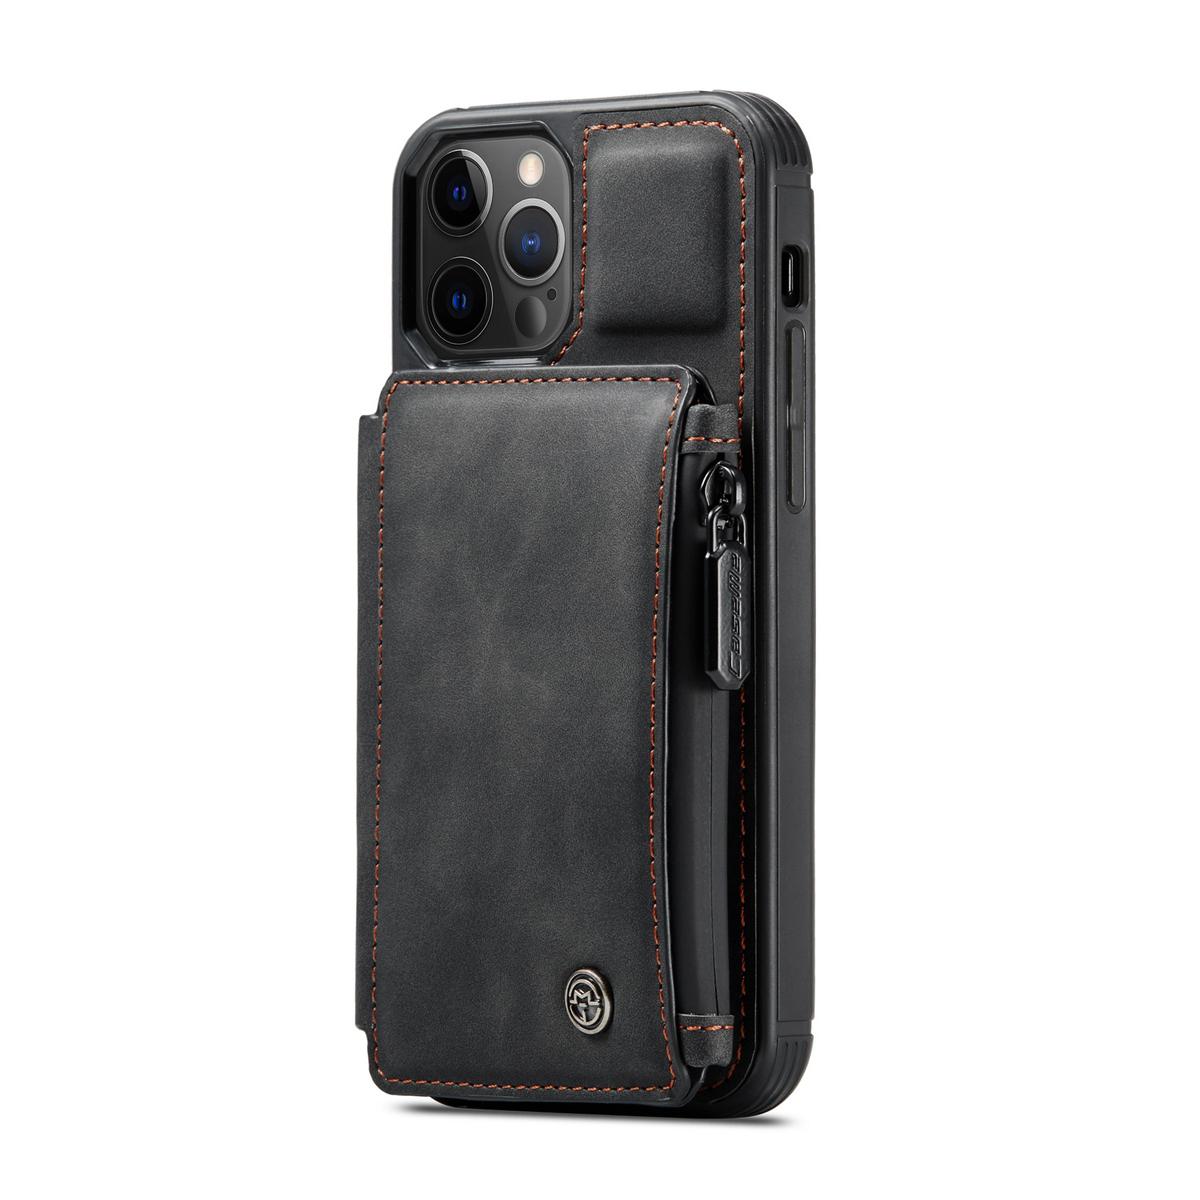 CaseMe C20 Series läderfodral till iPhone 12/12 Pro, svart